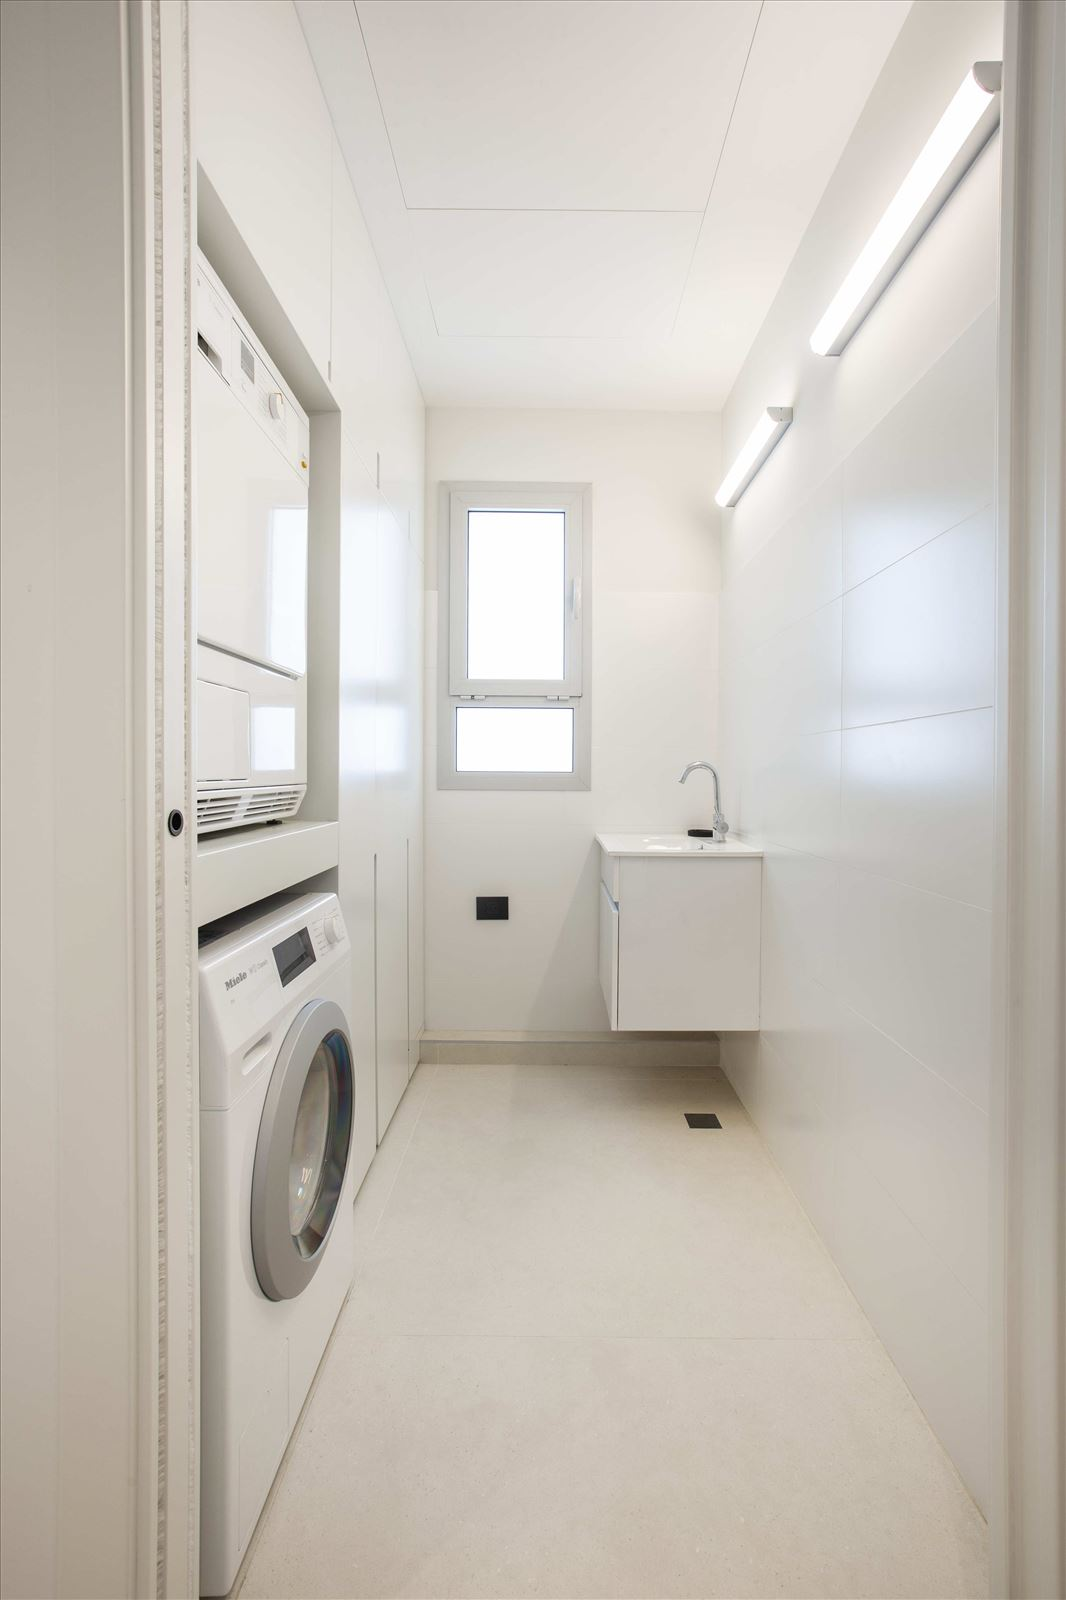 Tel Aviv apartment in Parisian aroma תאורה בחדר הכביסה מבית דורי קמחי